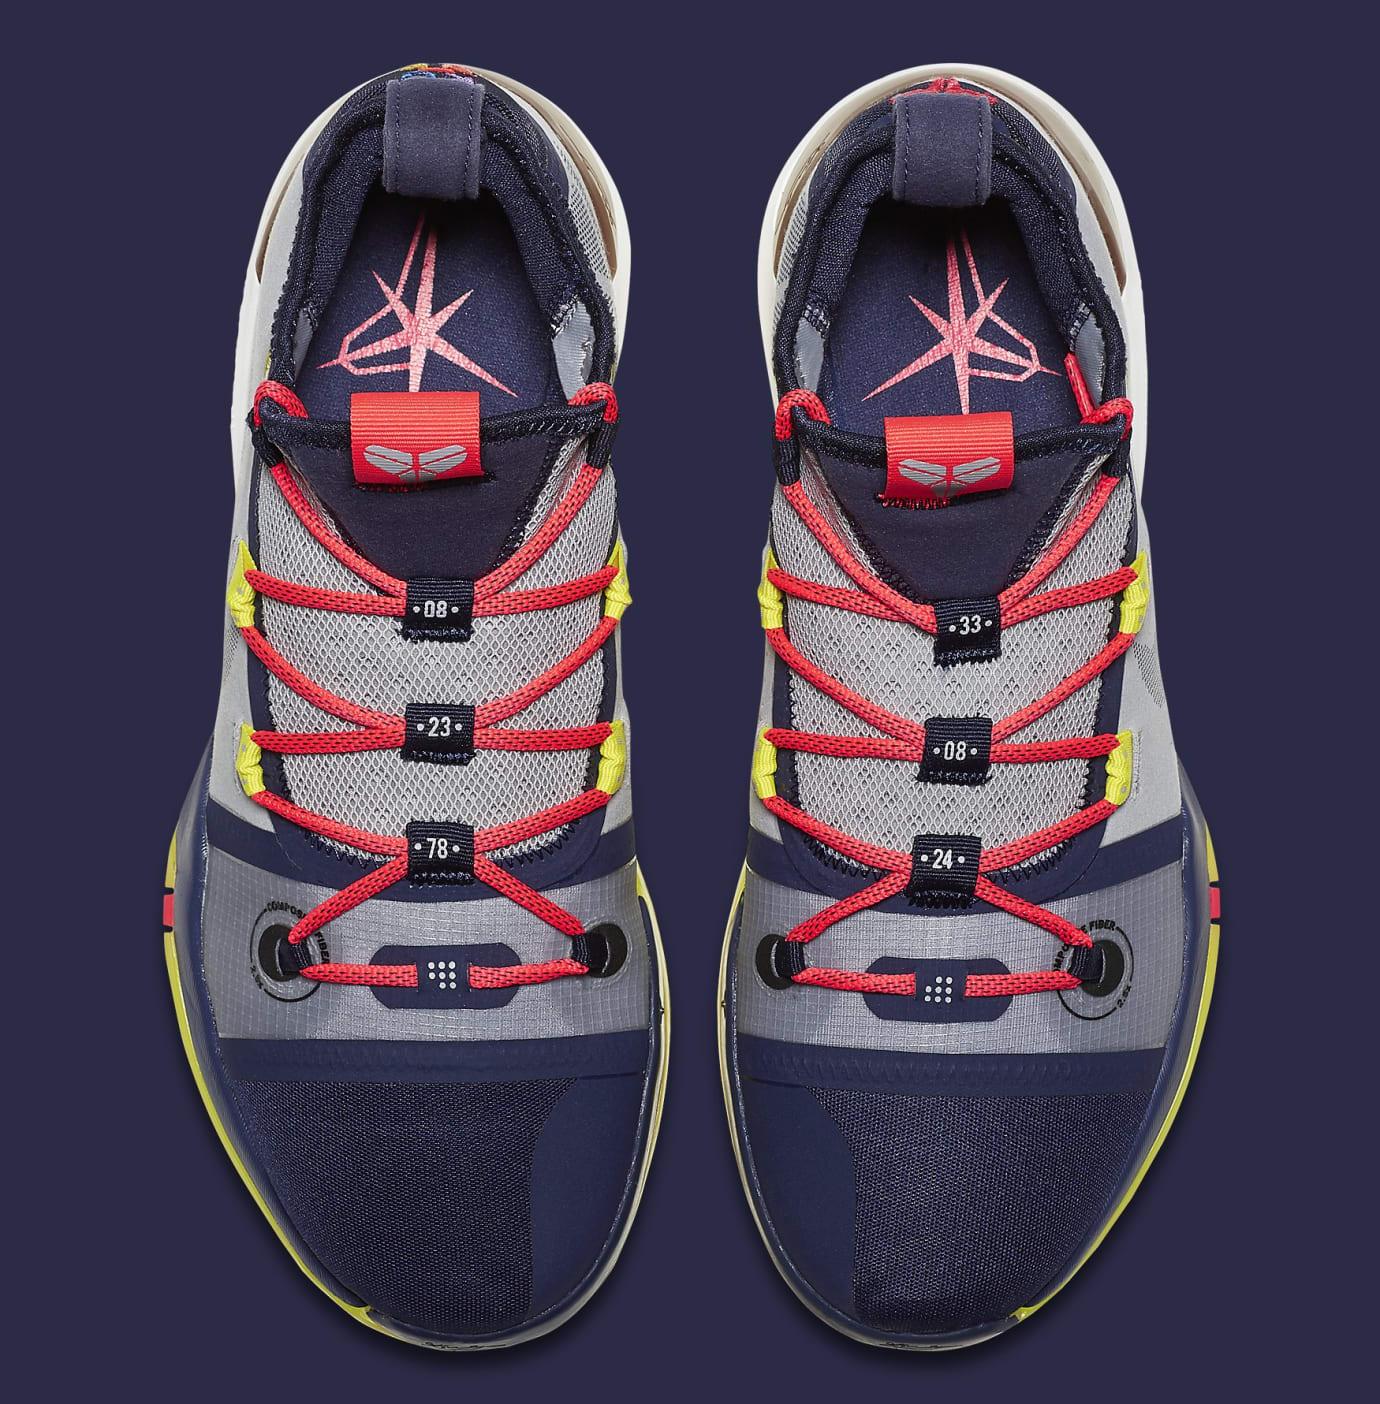 105643f6d2754b Image via Nike nike-kobe-ad-av3556-100-top